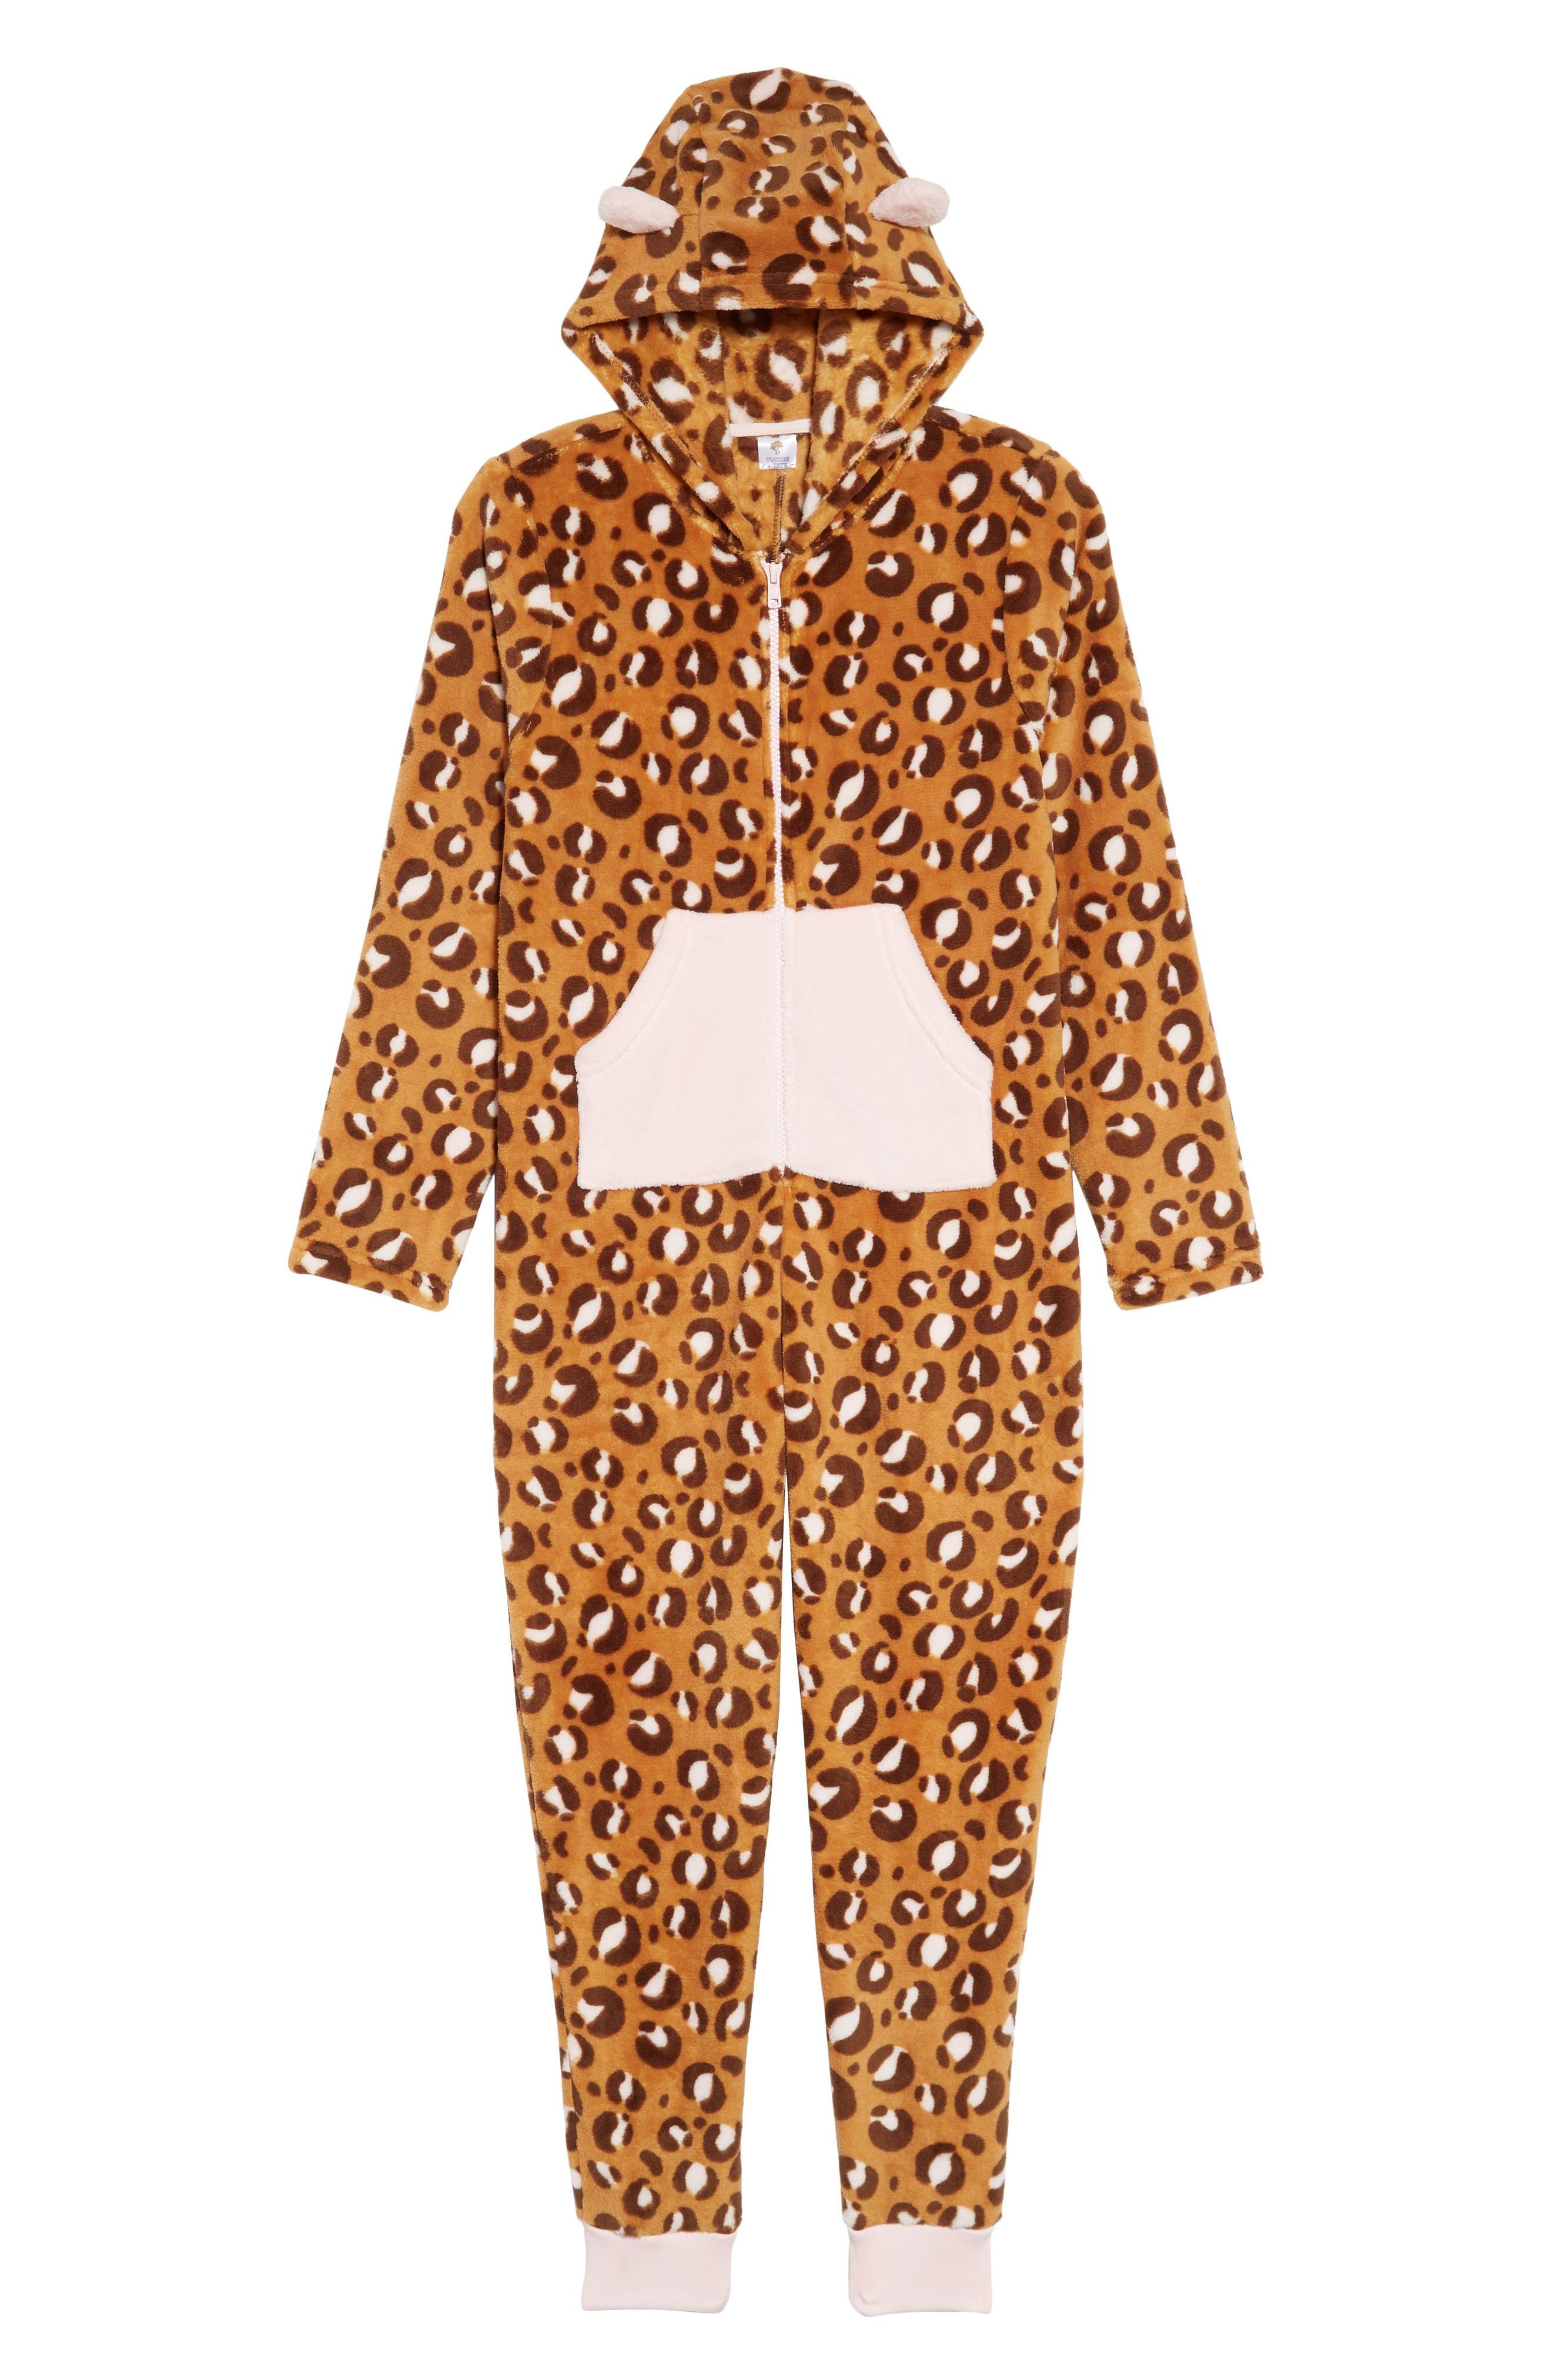 TUCKER + TATE, One-Piece Pajamas, Main thumbnail 1, color, TAN DALE PUNK CHEETAH